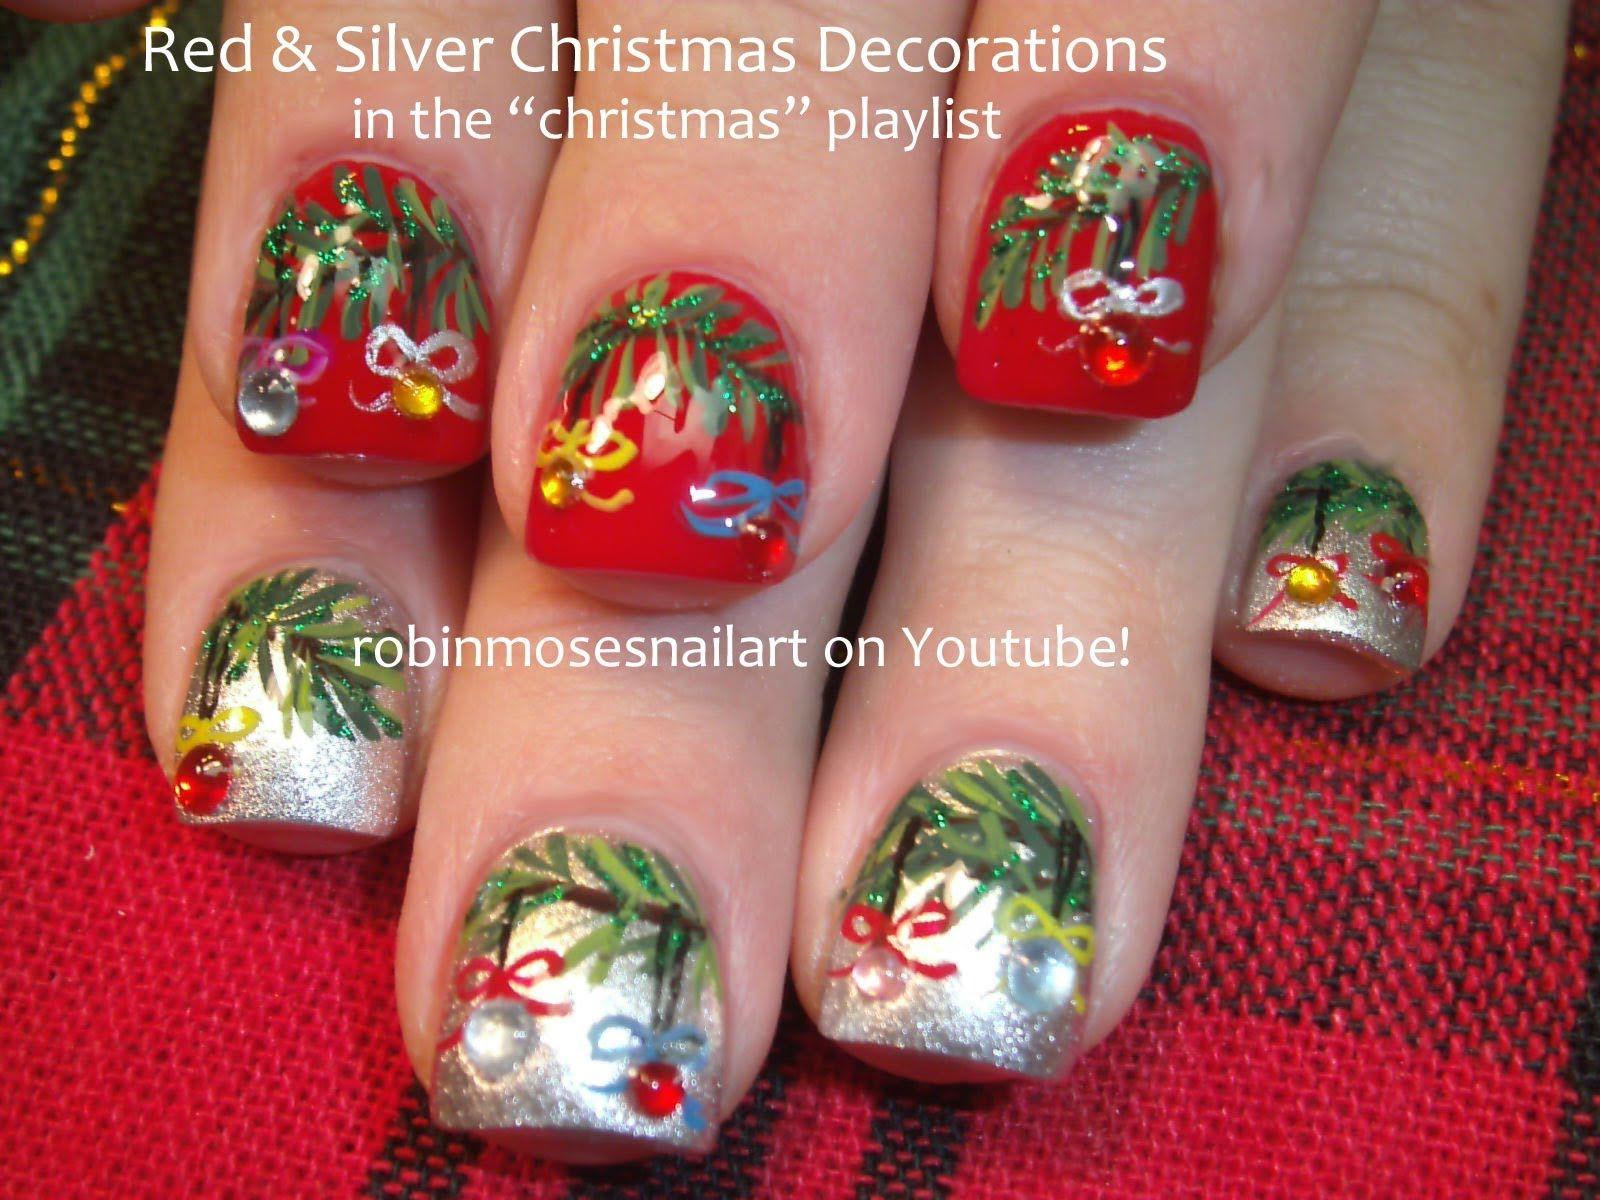 Christmas Nail Art Tutorials Are Here Easy Xmas Nail Art Design To